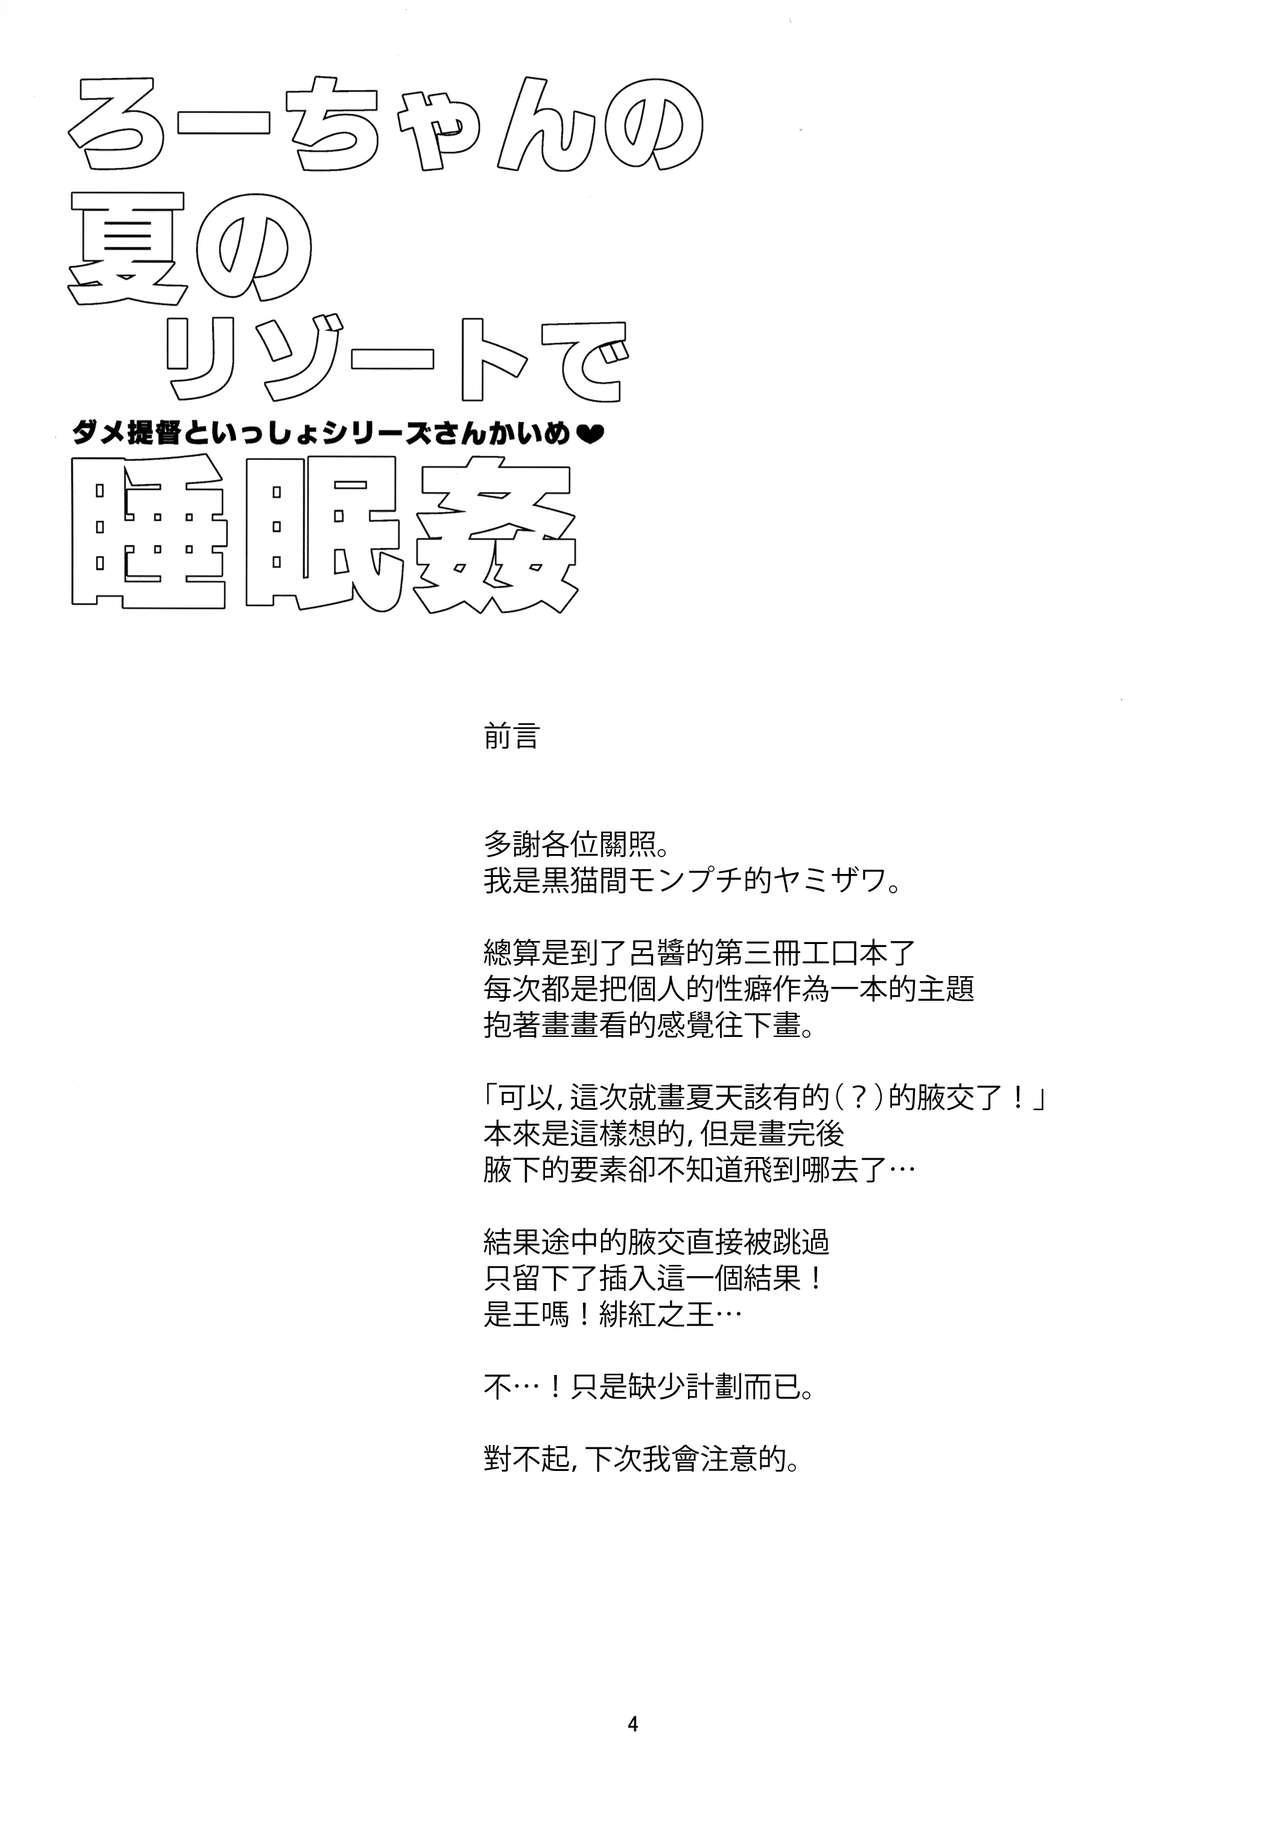 Ro-chan no Natsu no Resort de Suiminkan 3